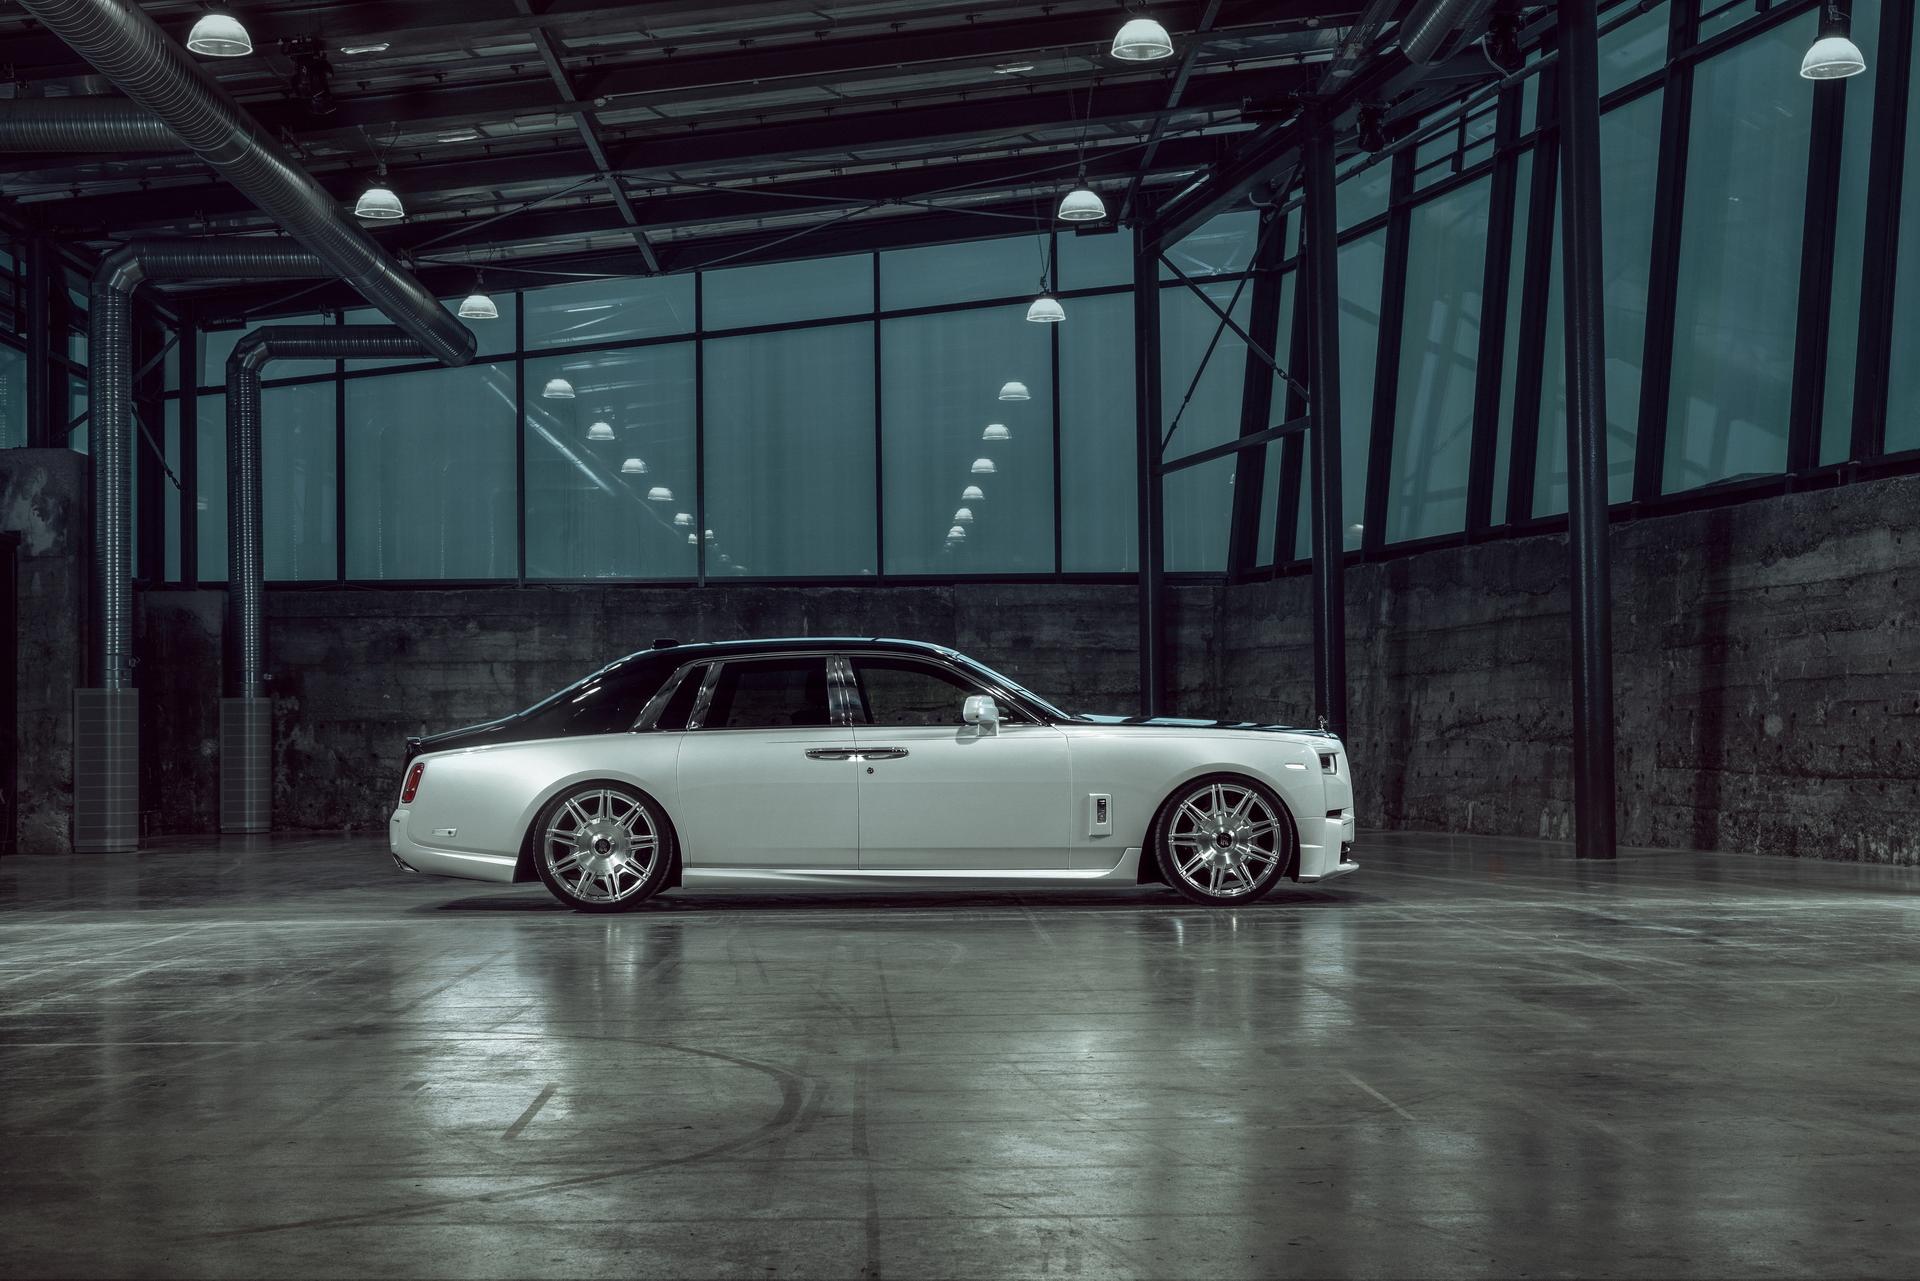 Rolls-Royce Phantom 8 Side